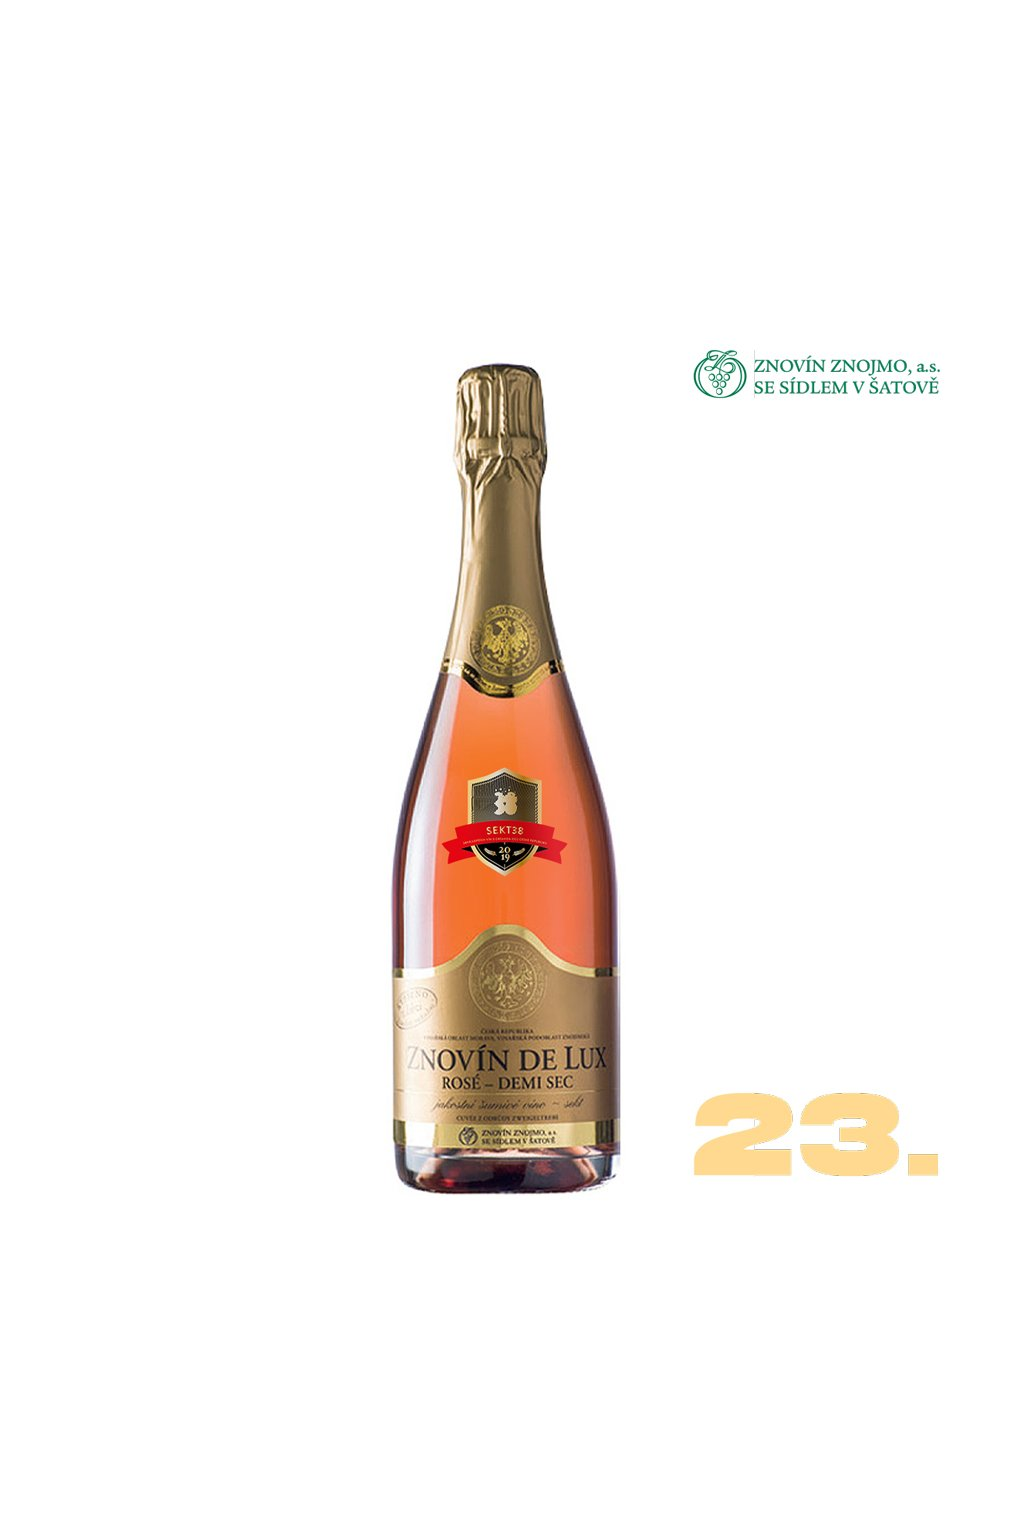 23 Znovin de Lux rose dem sec